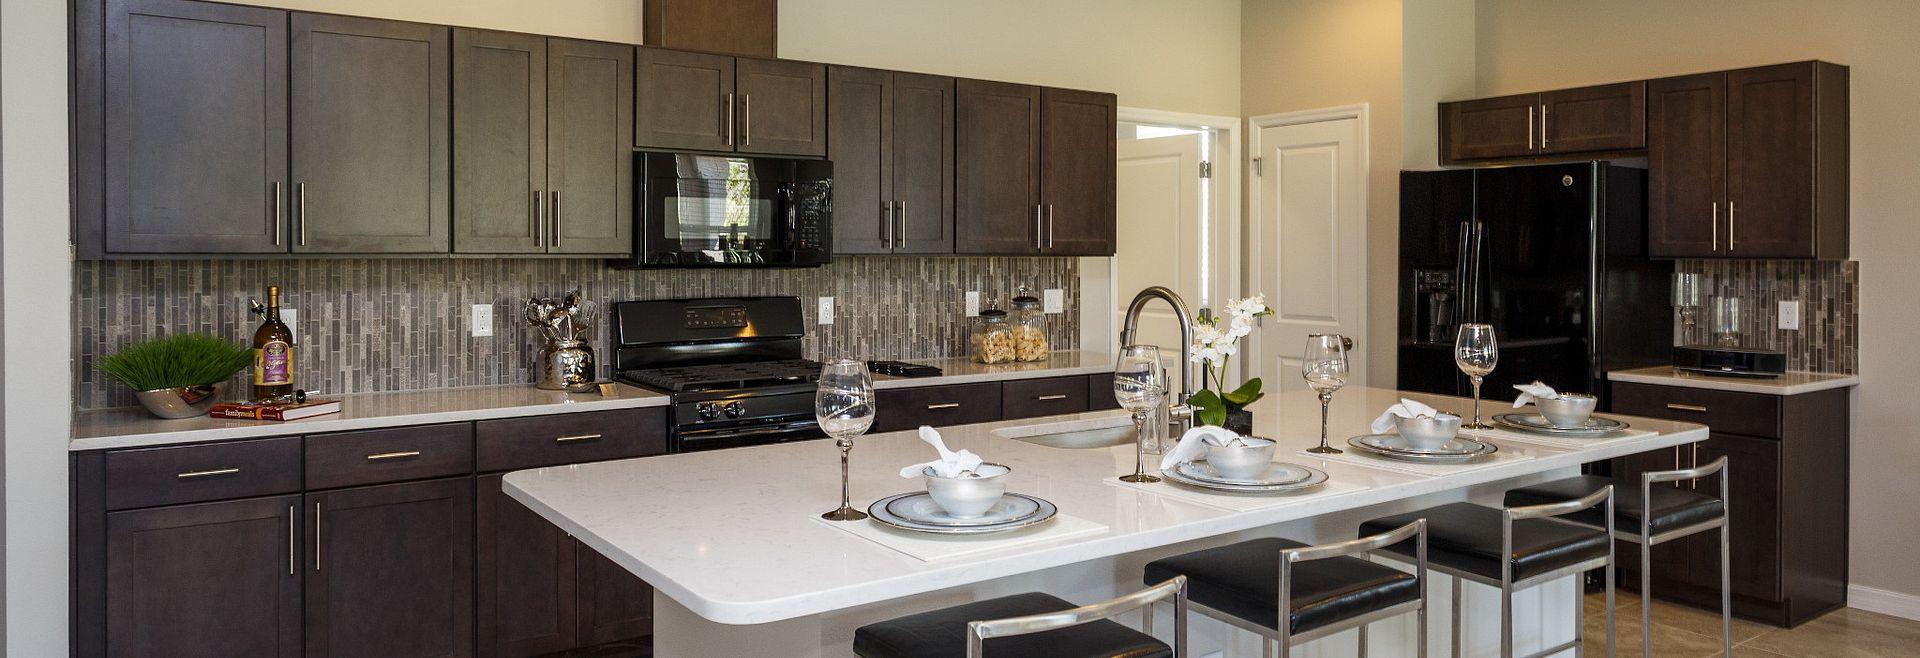 Trilogy Orlando Affirm Model Kitchen